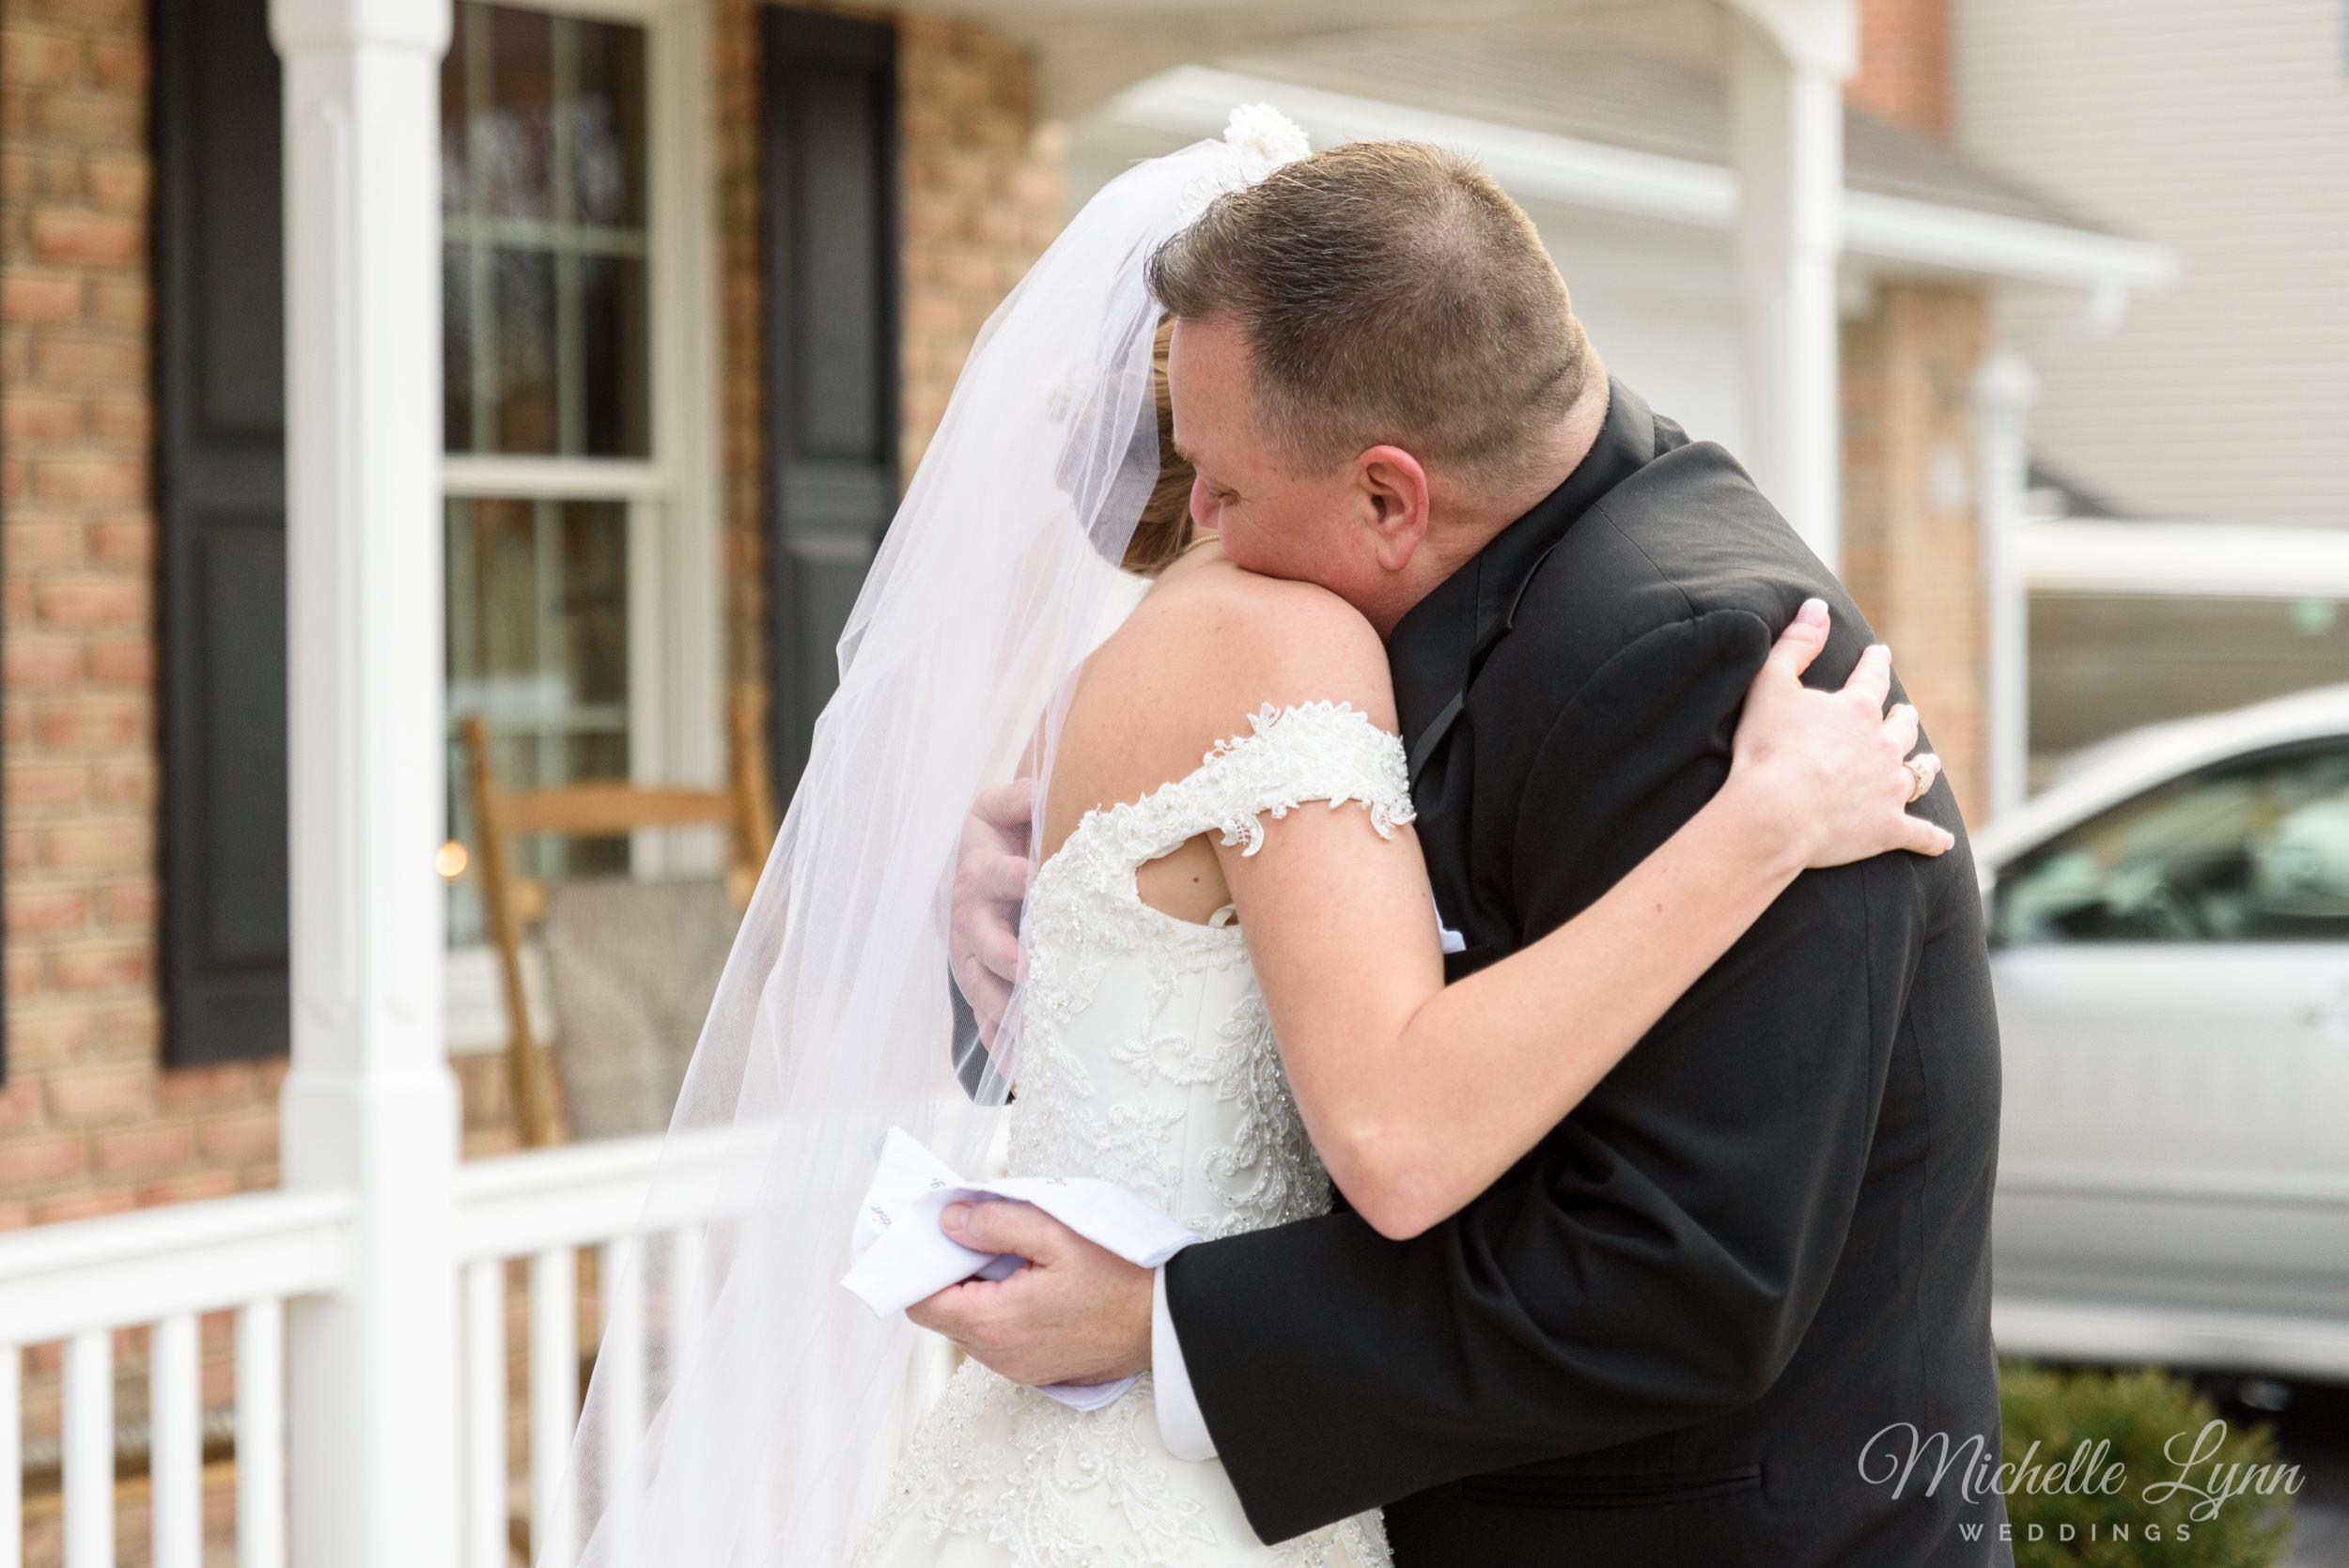 william-penn-inn-wedding-photography-mlw-25.jpg